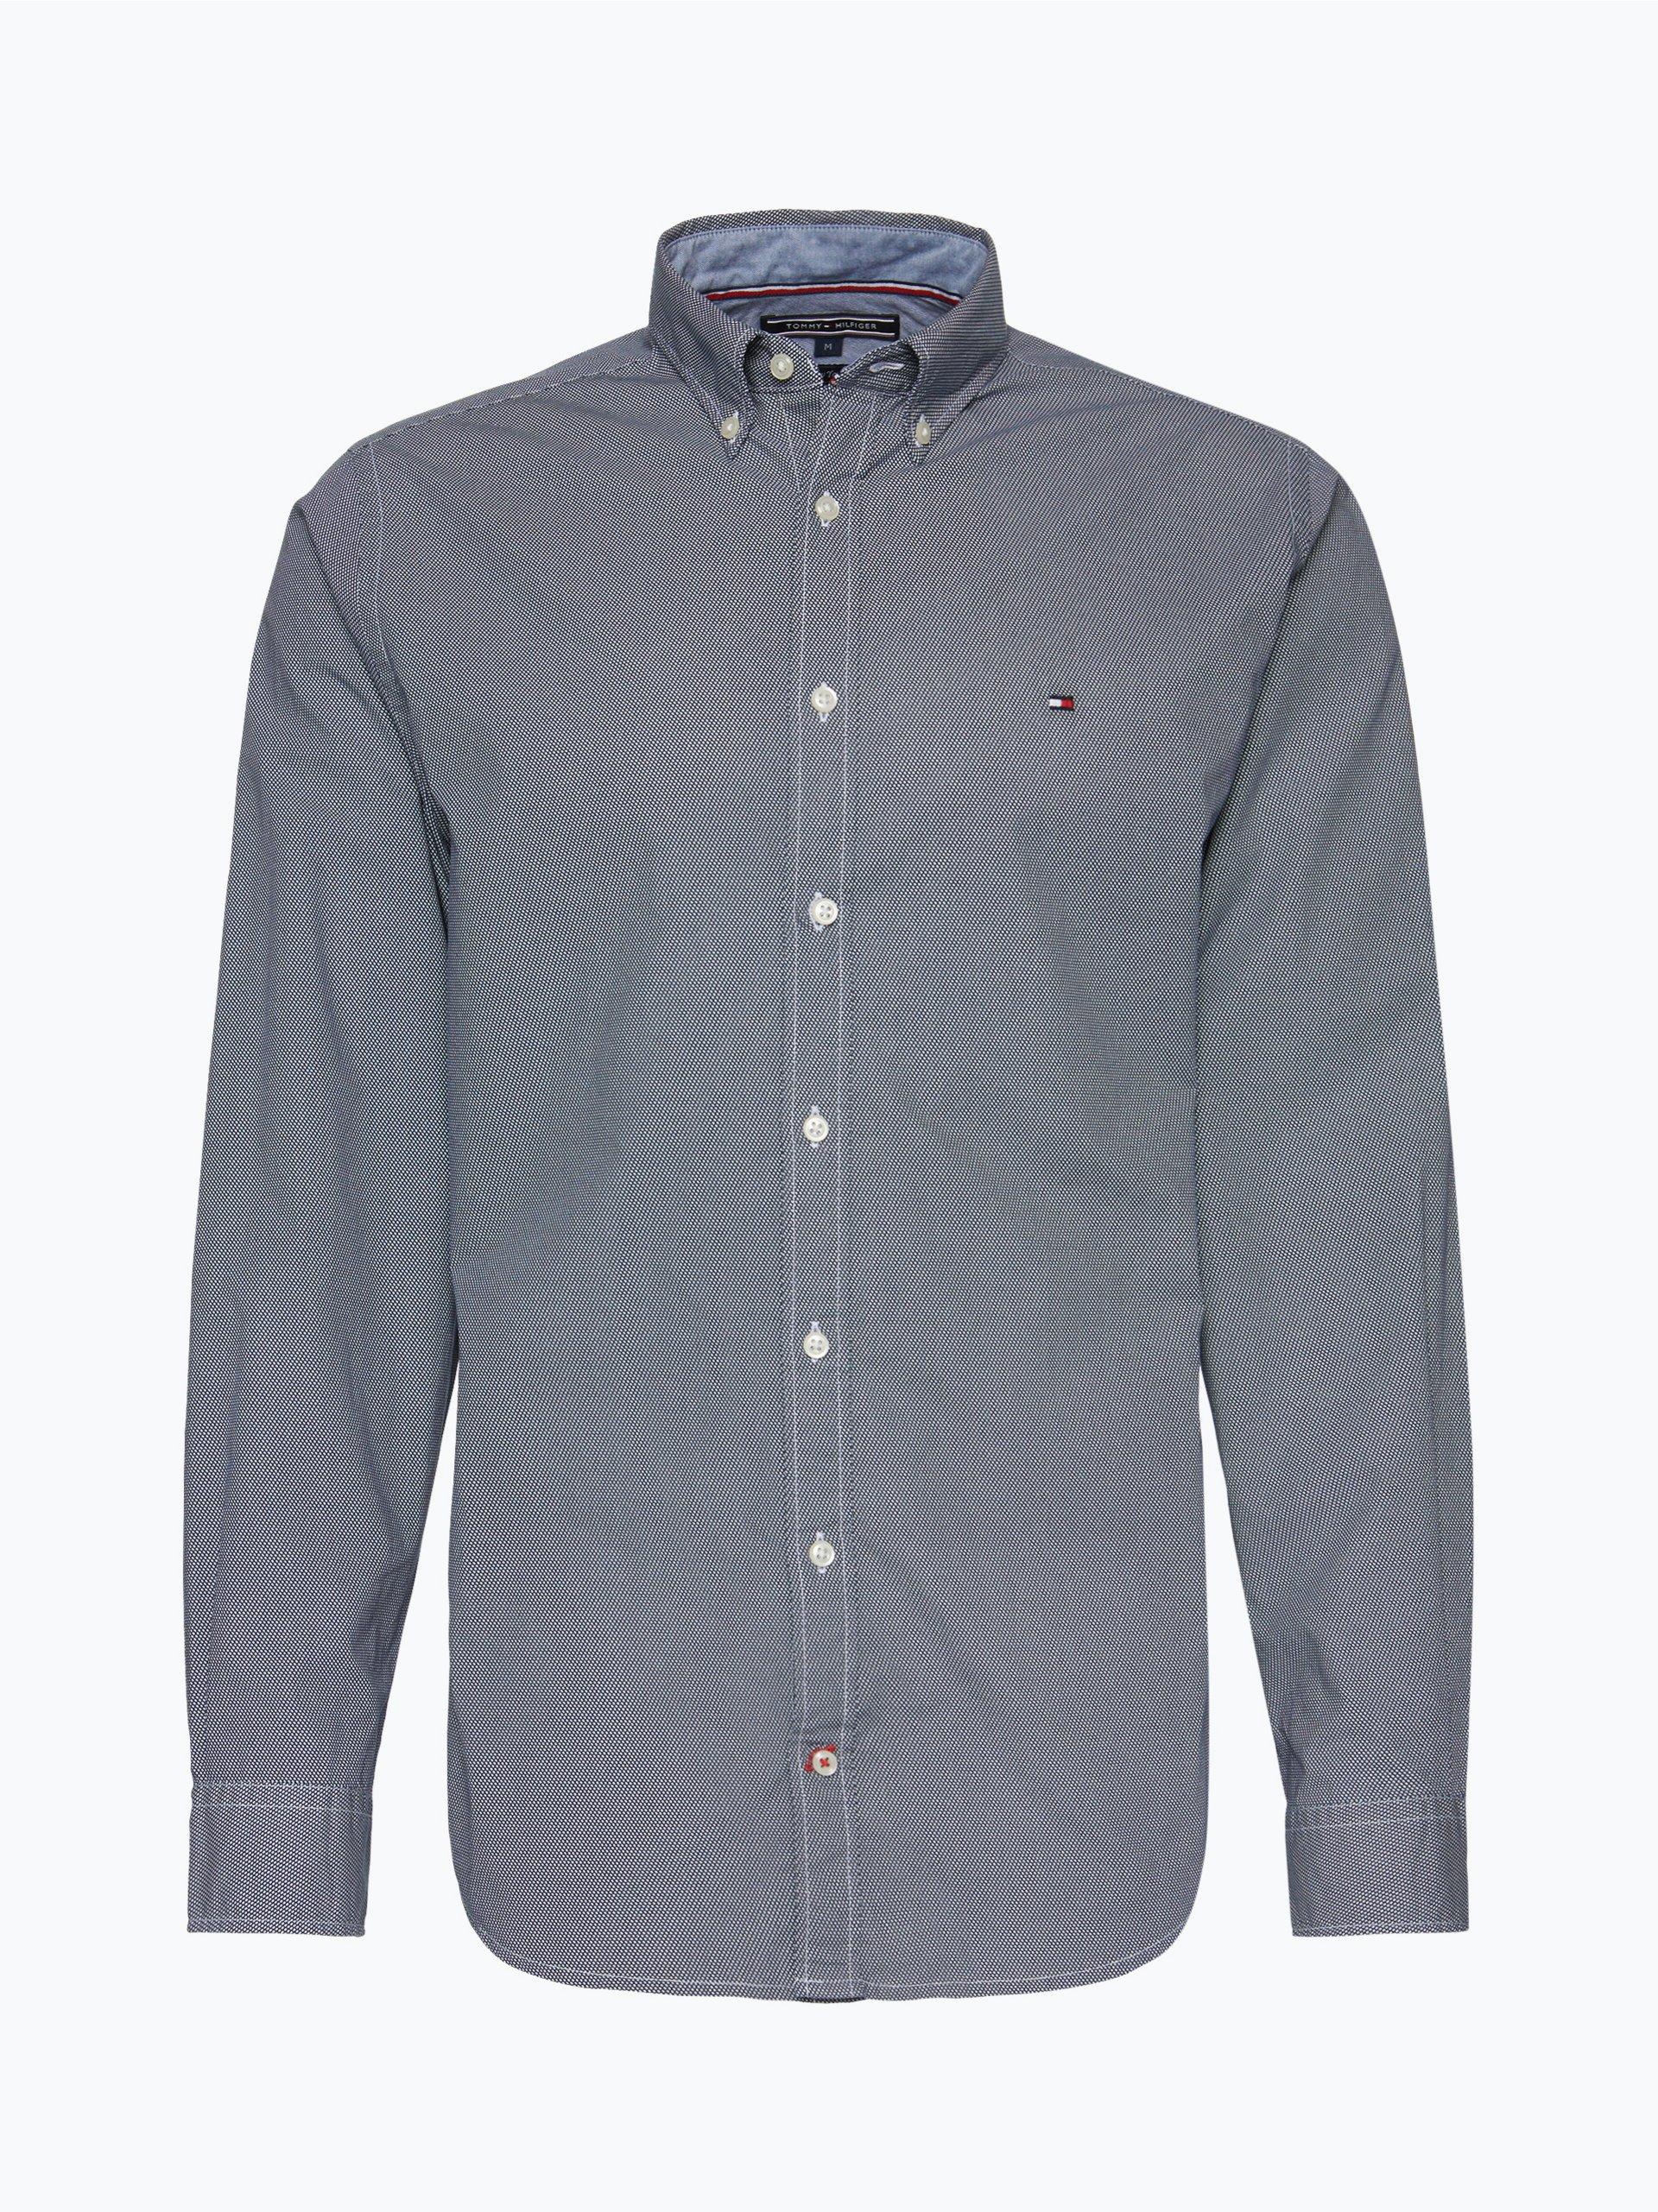 tommy hilfiger herren hemd marine gemustert online kaufen vangraaf com. Black Bedroom Furniture Sets. Home Design Ideas